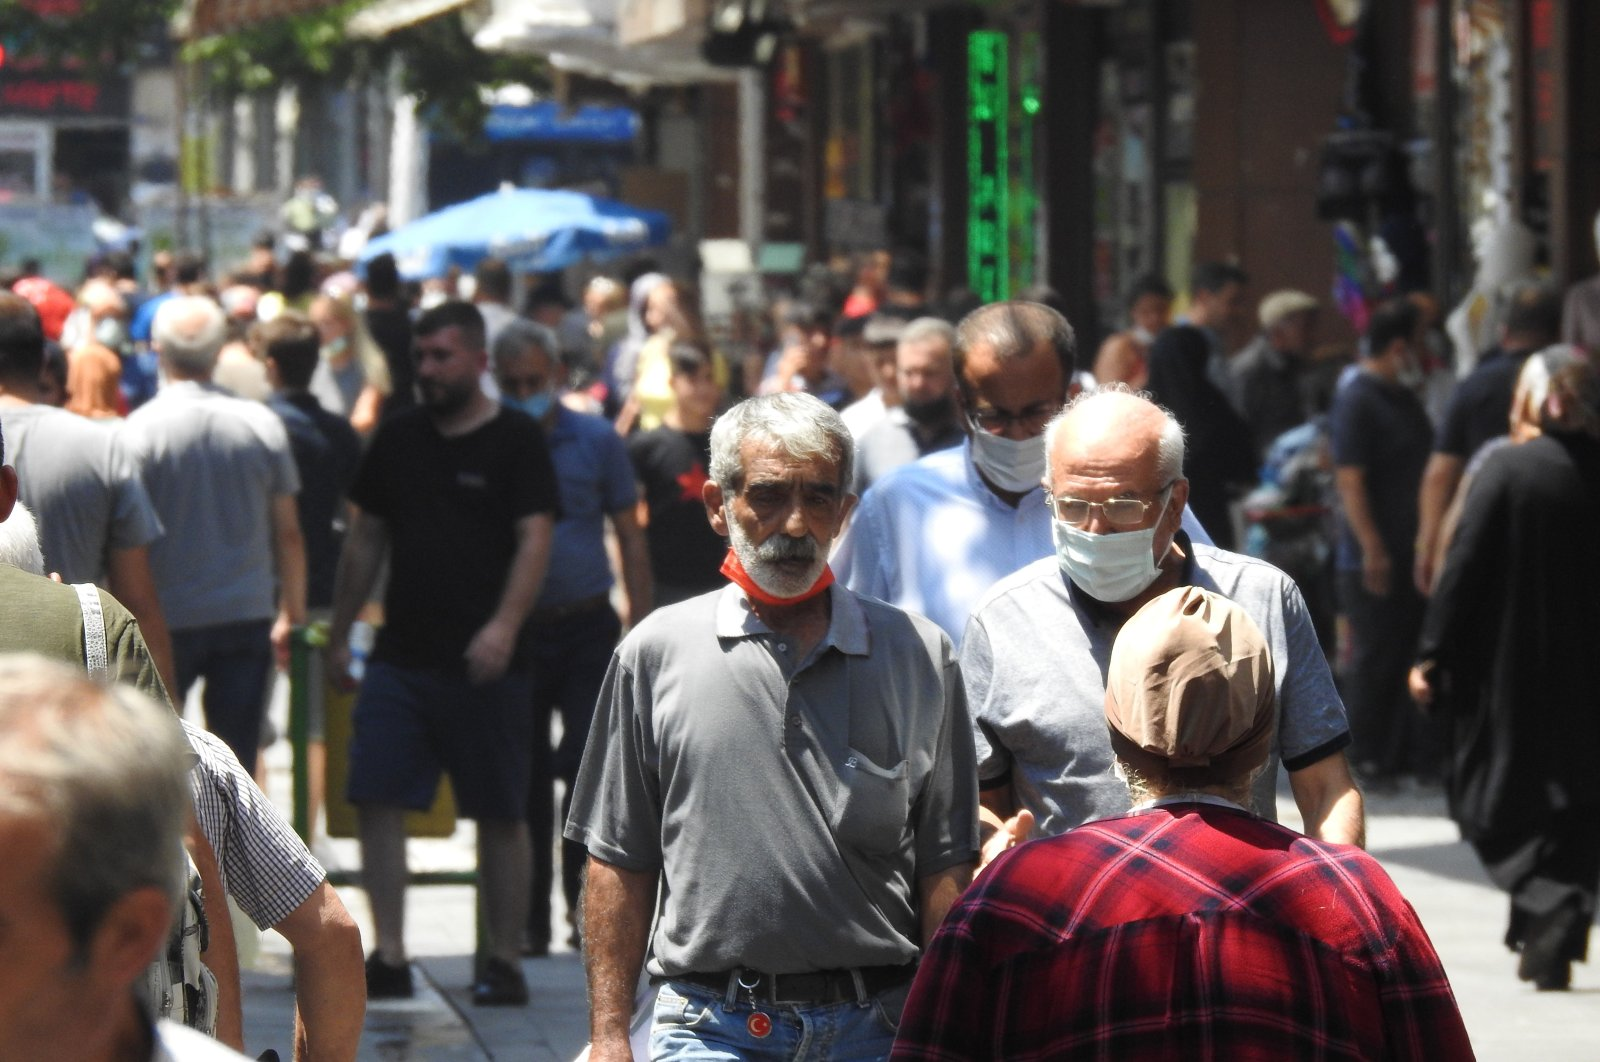 People wearing protective masks walk on a street in Gaziantep, Turkey, Aug. 3, 2021. (IHA PHOTO)